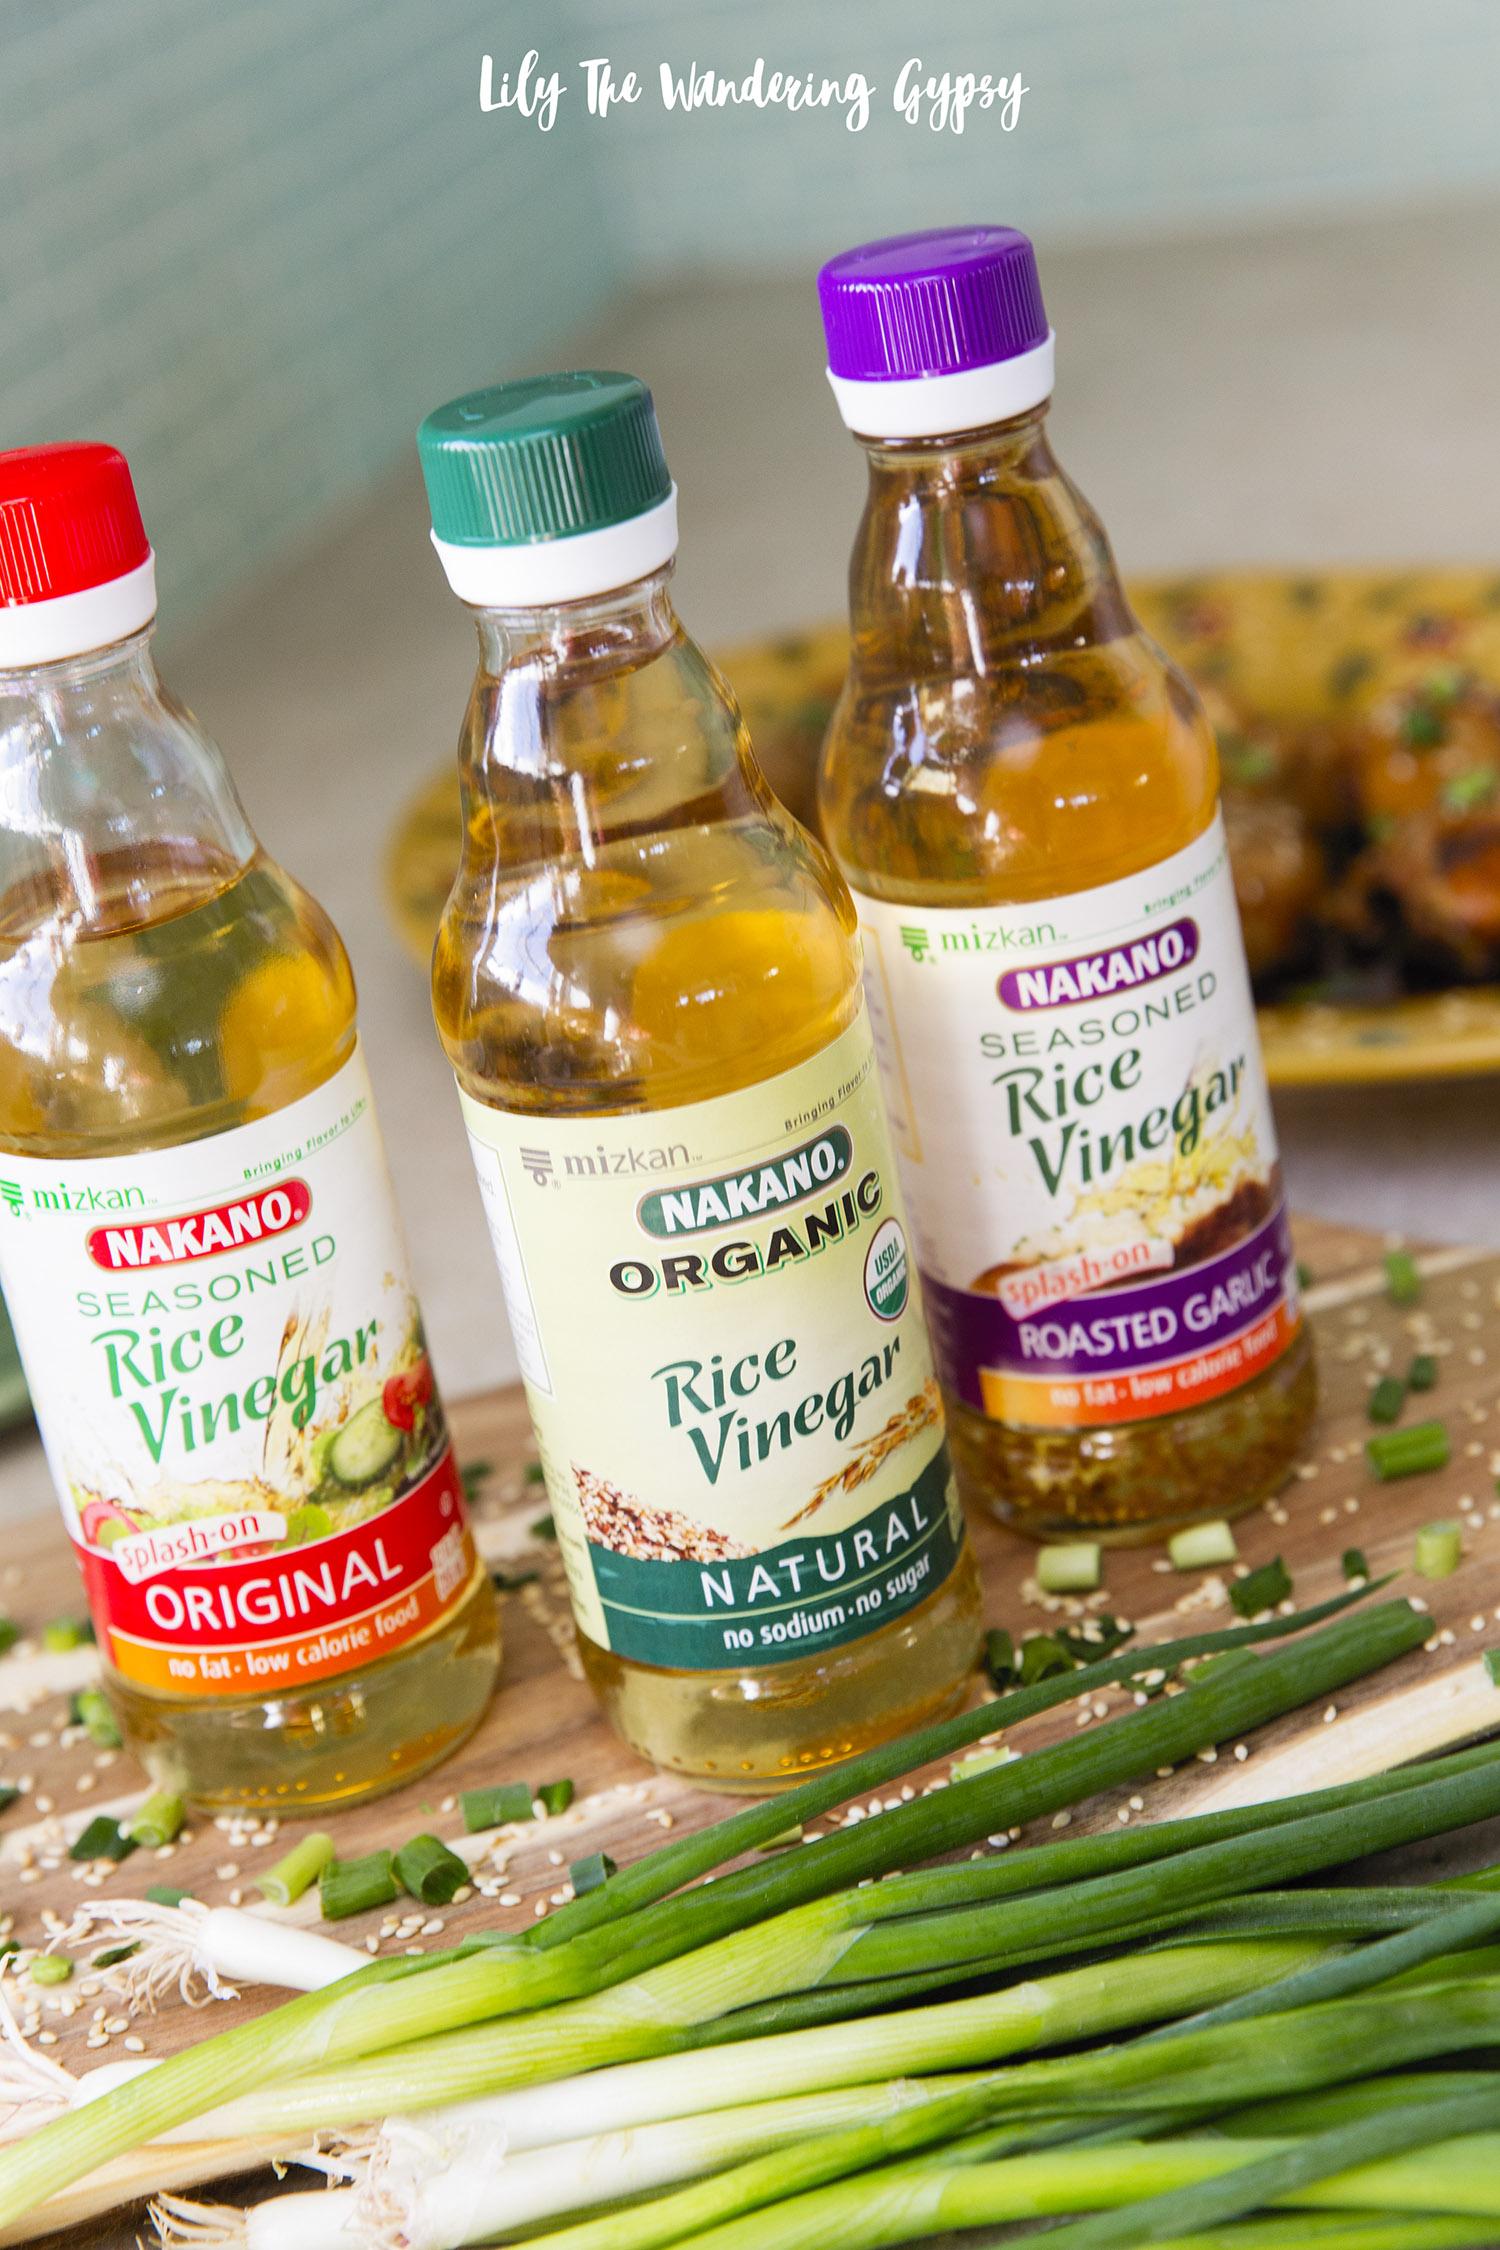 NAKANO Rice Vinegar